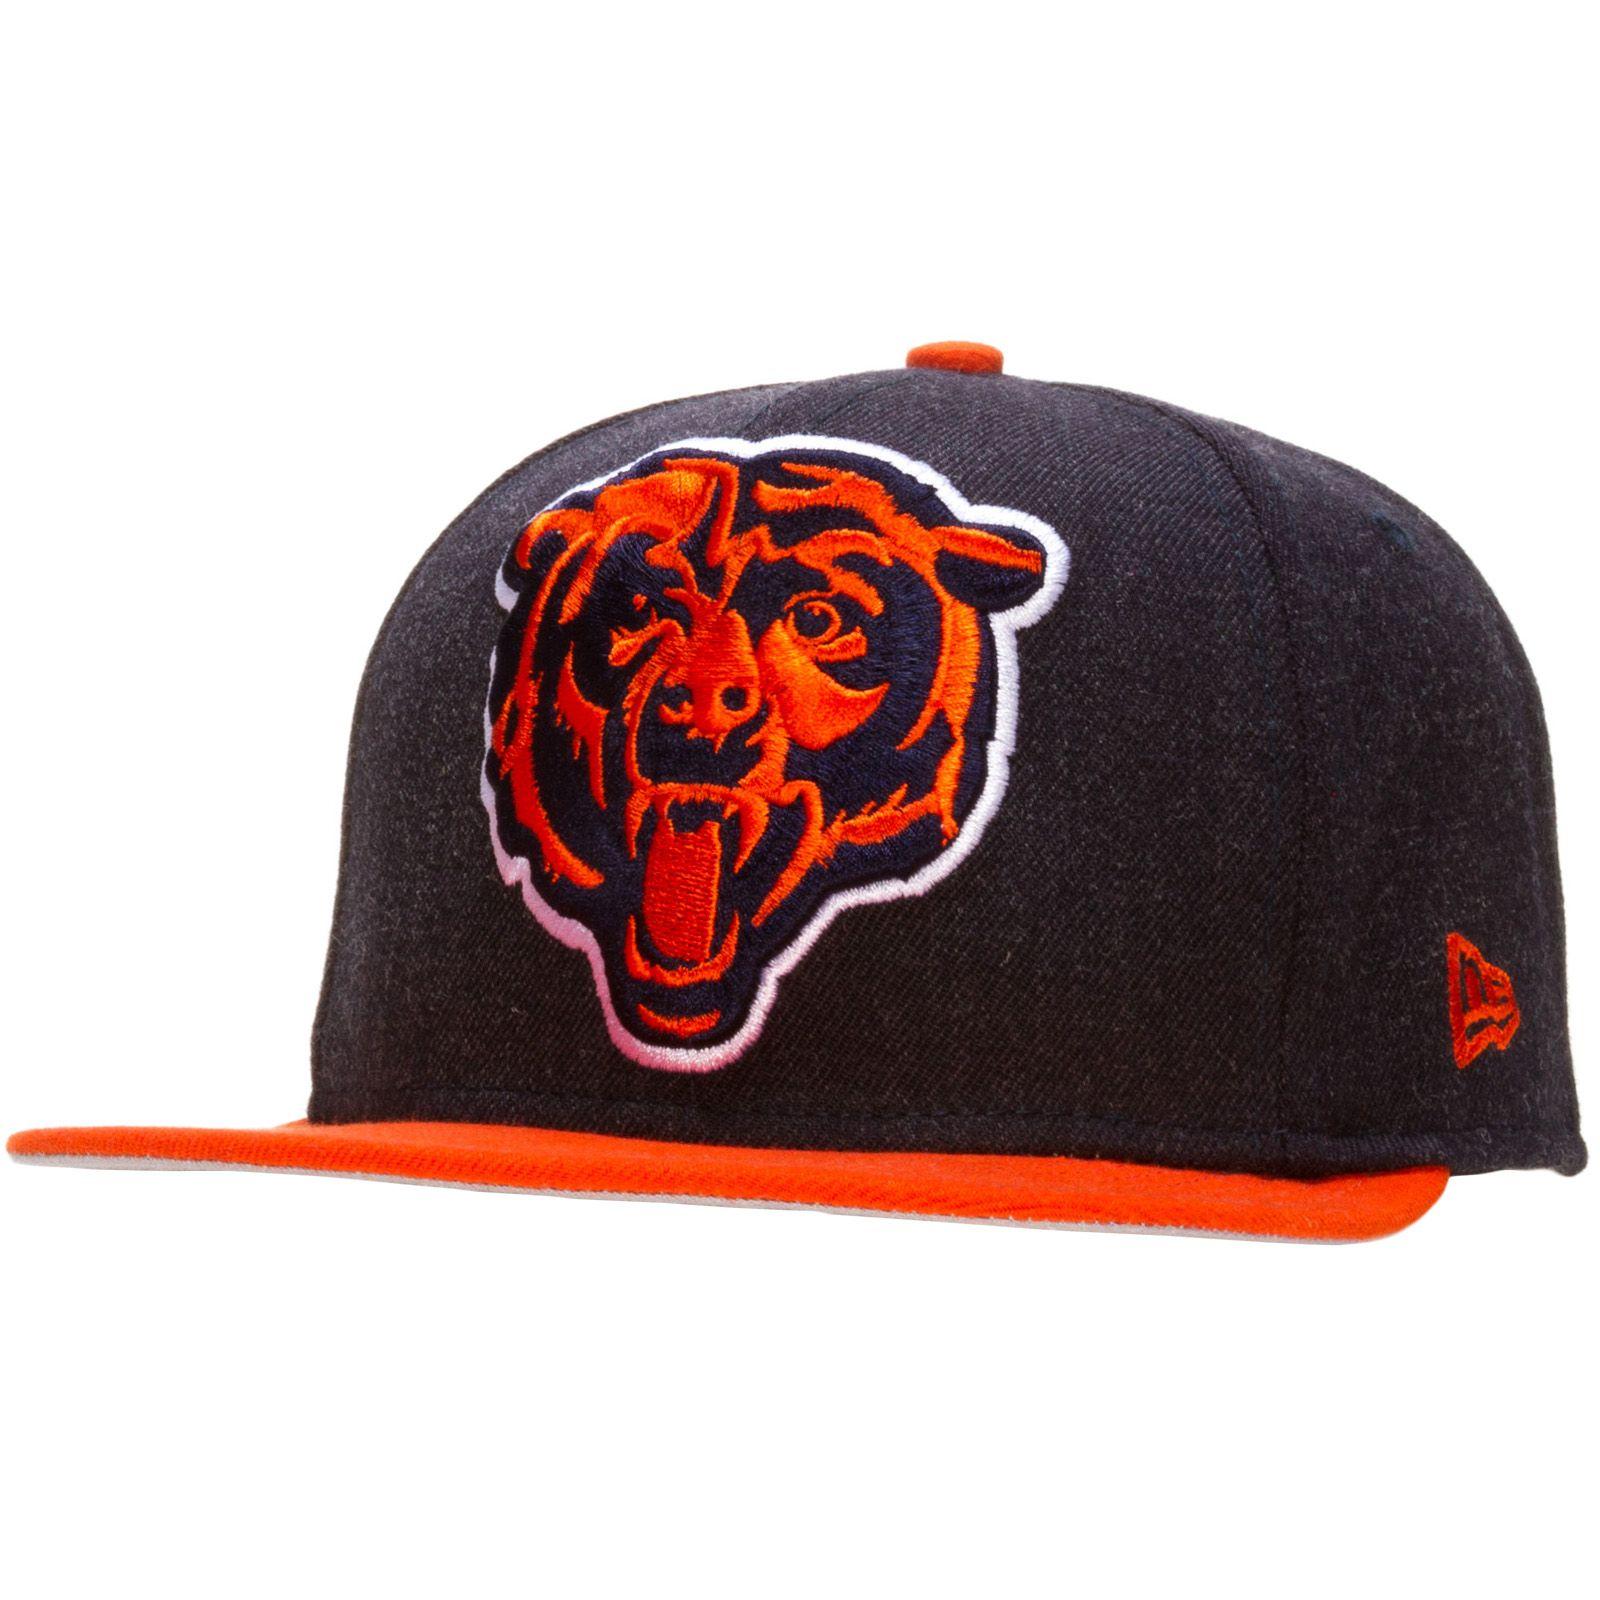 Chicago Bears Denim and Orange Oversize Angry Bear Logo